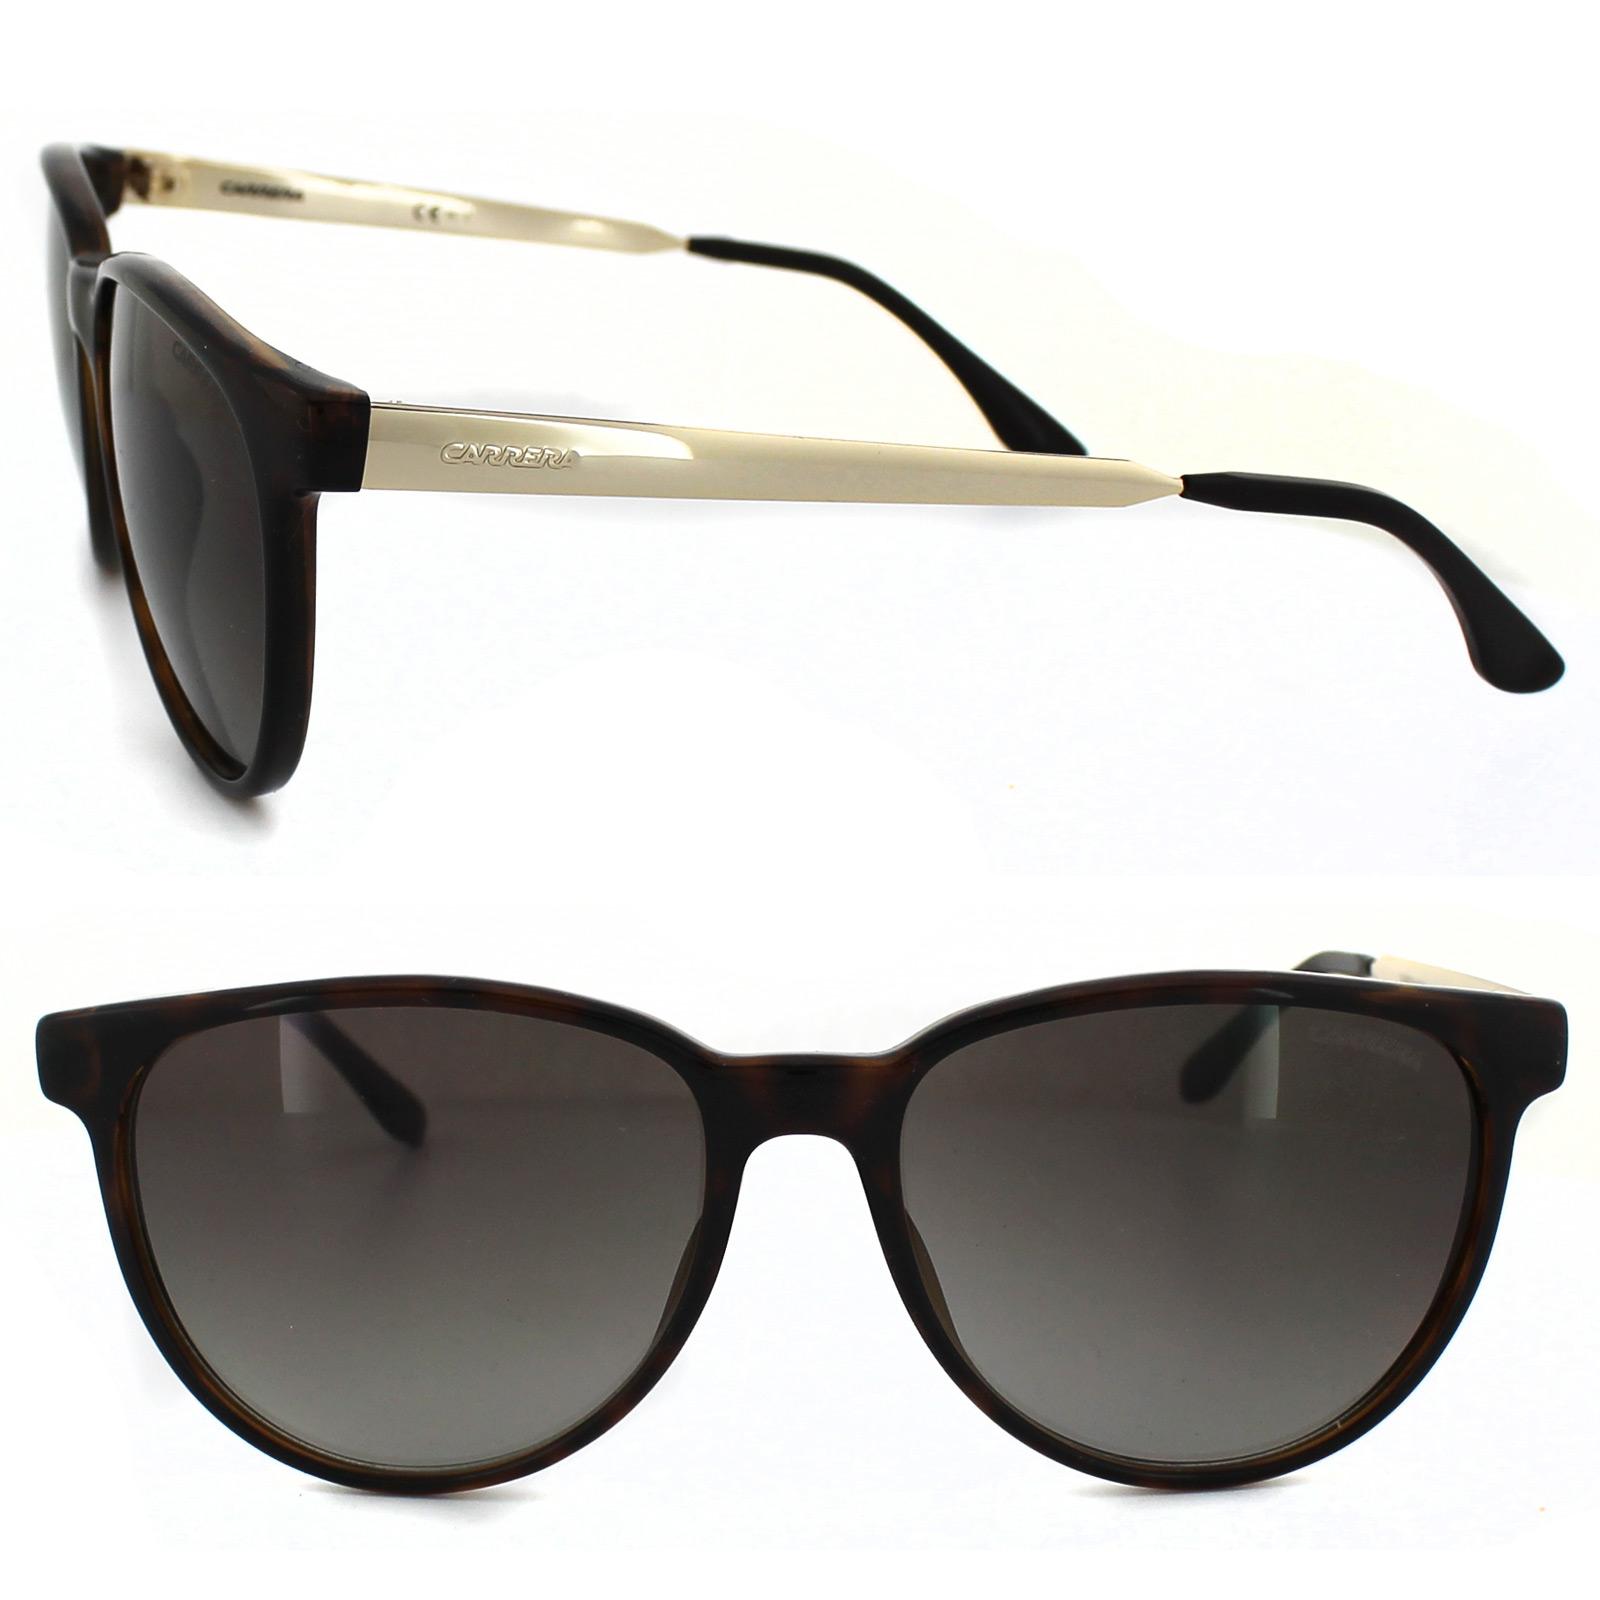 Cheap Carrera Carrera 6014 Sunglasses Discounted Sunglasses